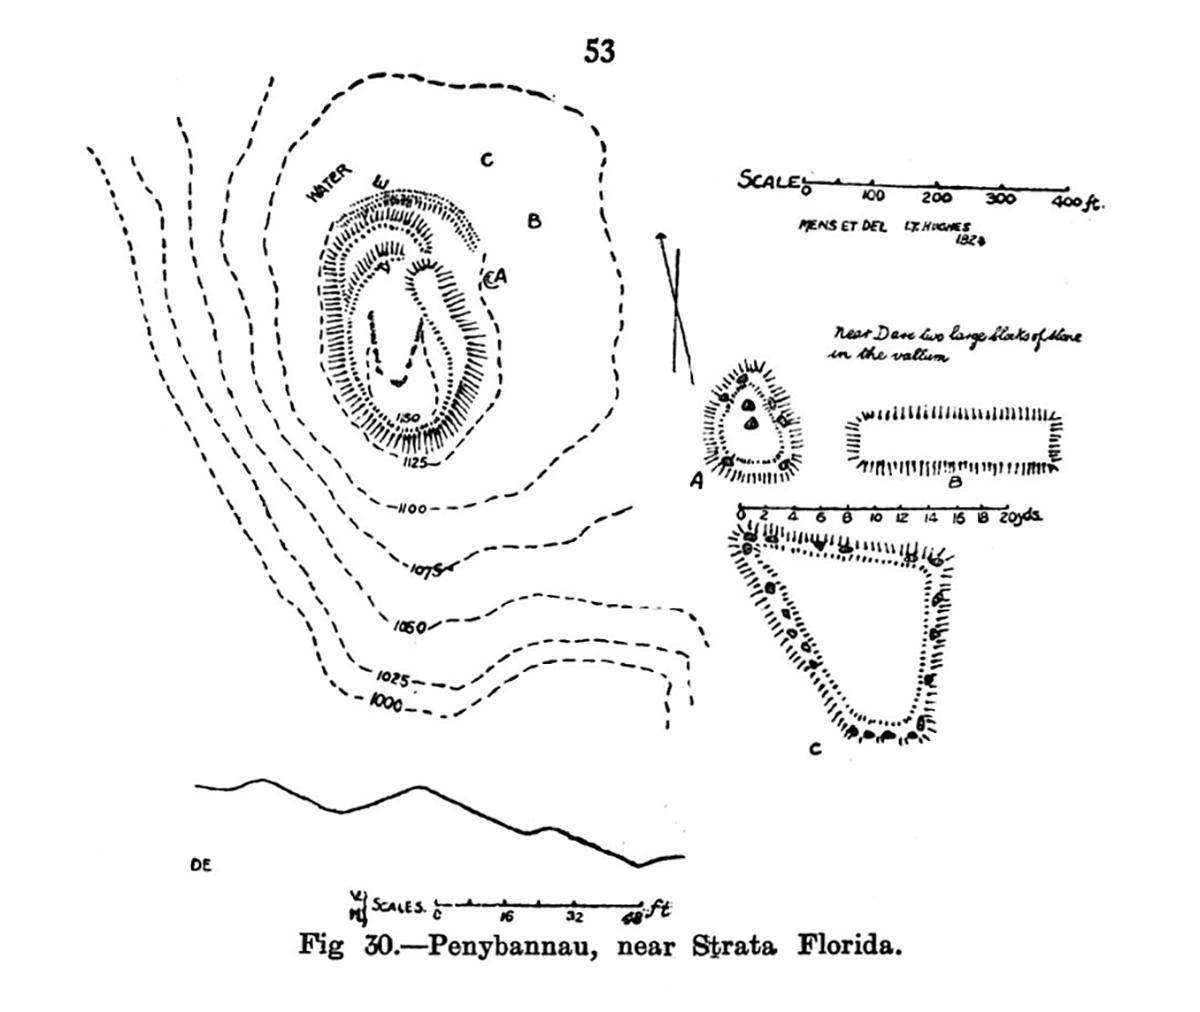 Site plan Penybannau near Strata Florida